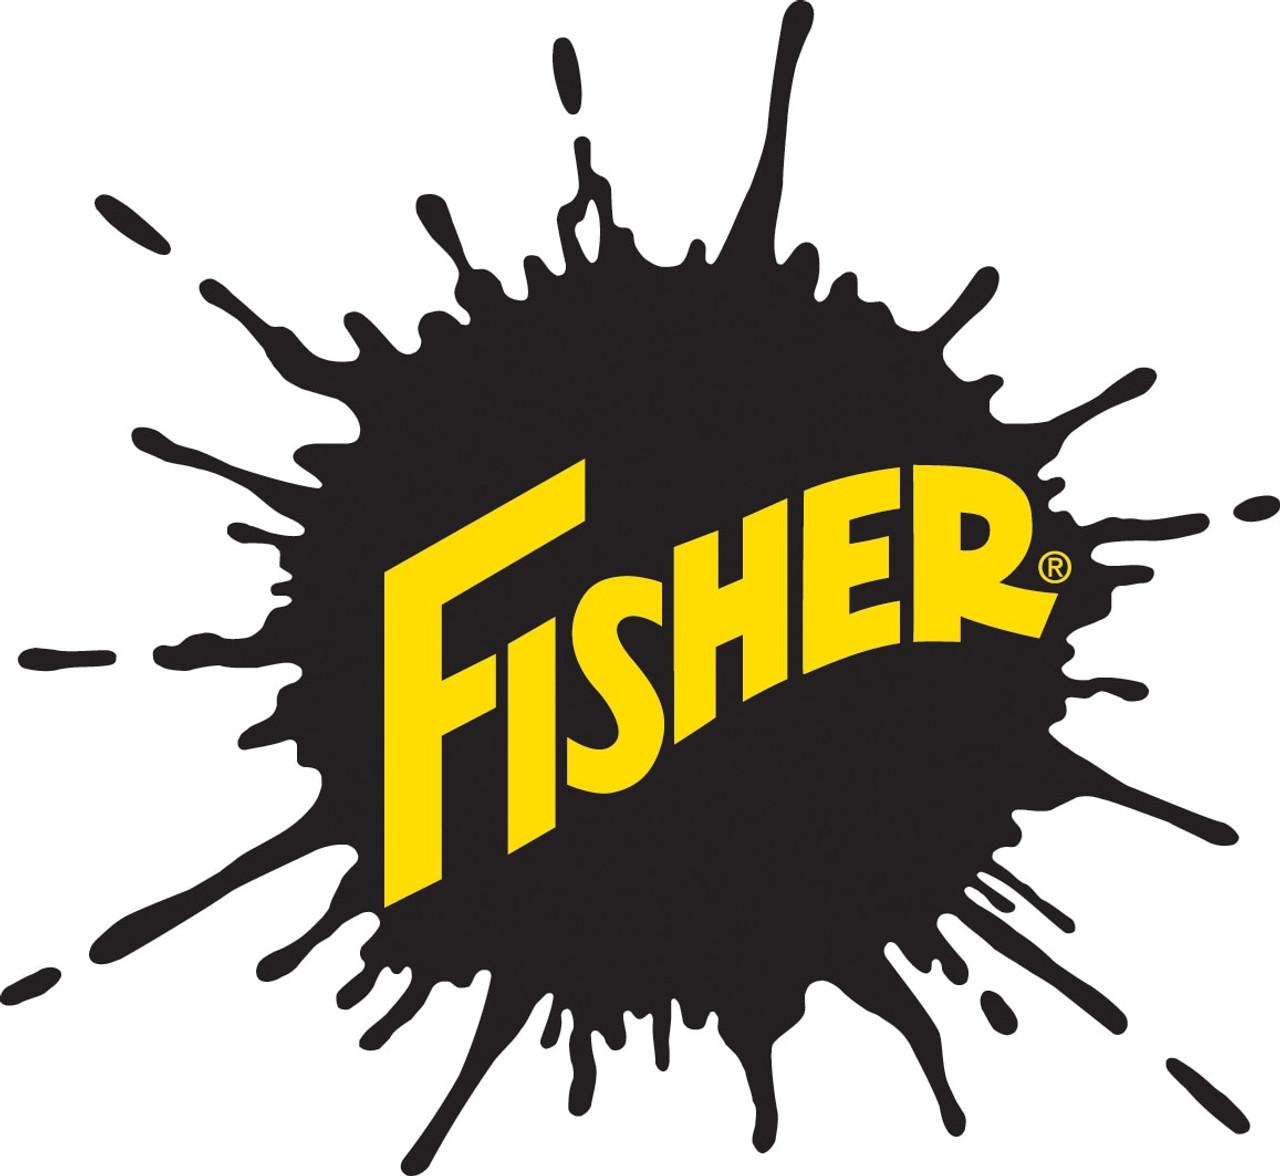 86870 FISHER XV2 EXTREME WEAR SHOE KIT